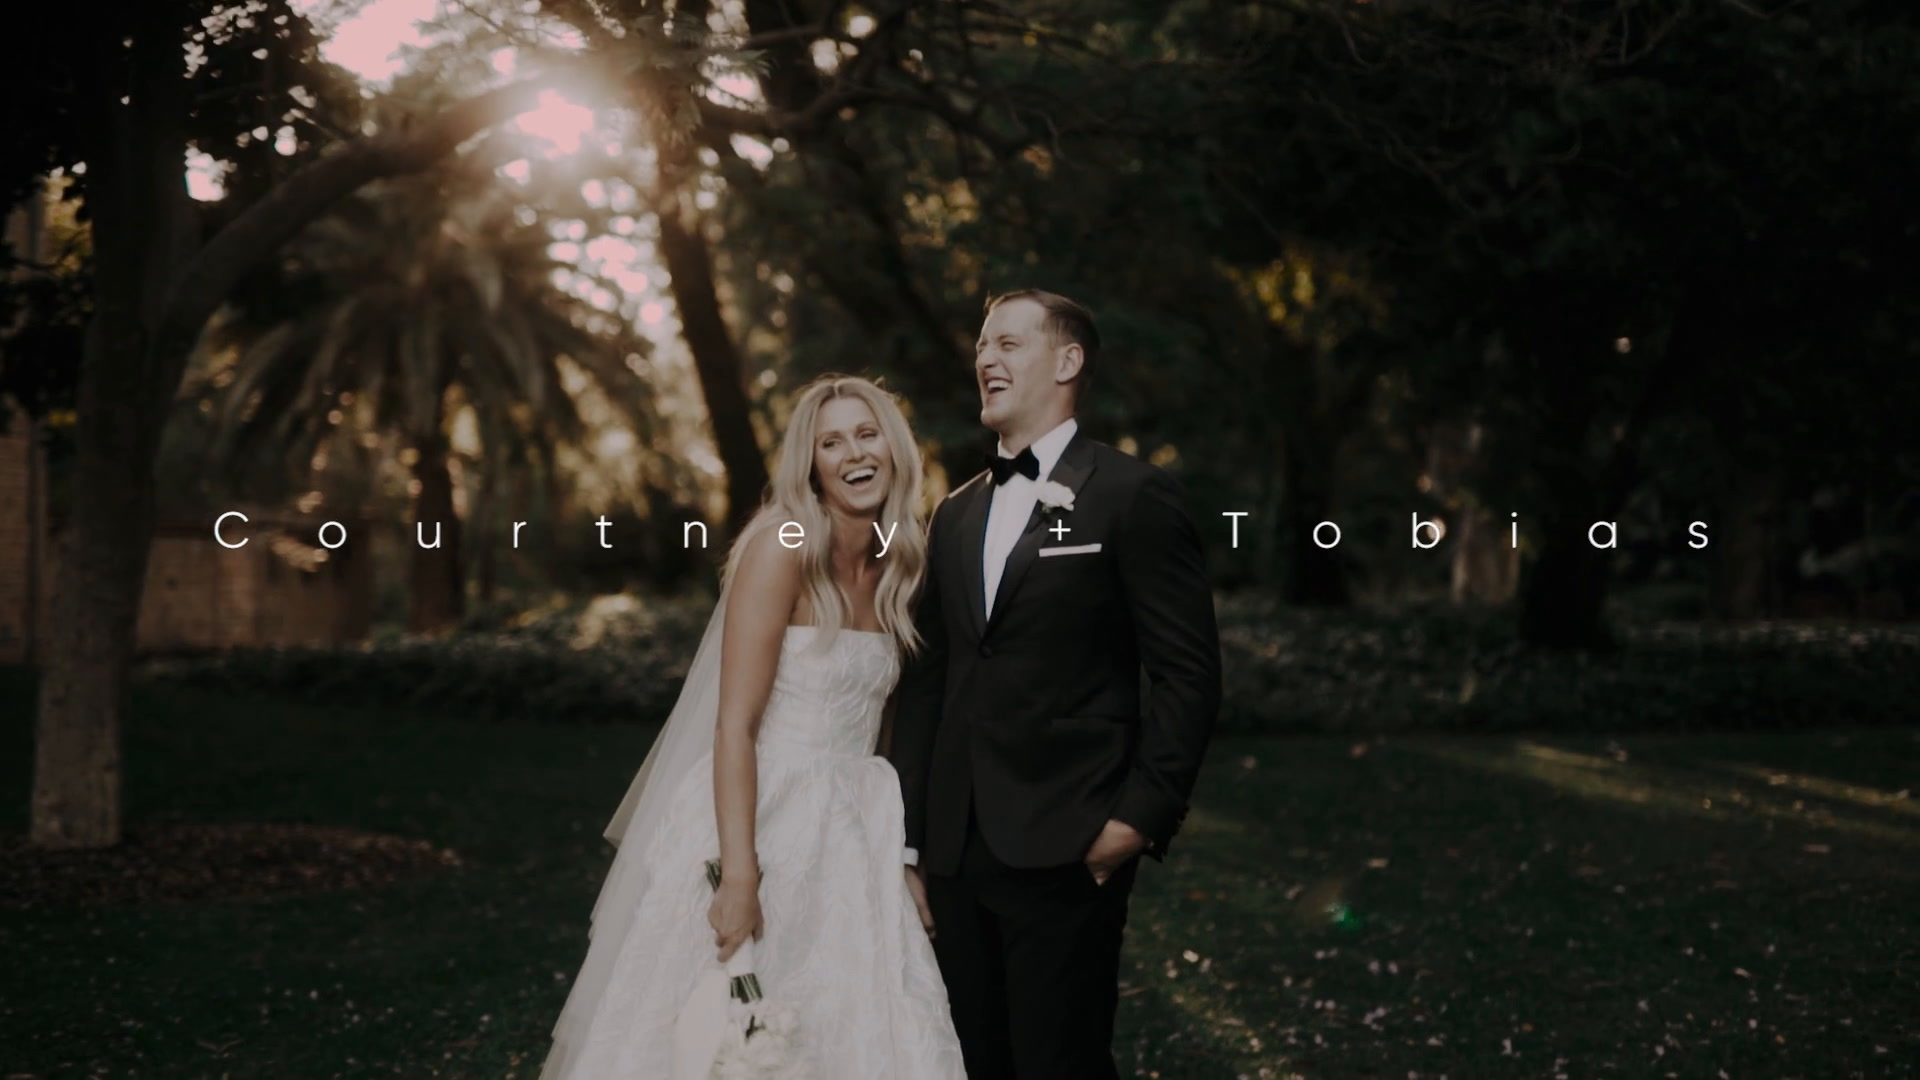 Courtney + Tobias   Perth, Australia   Matilda Bay